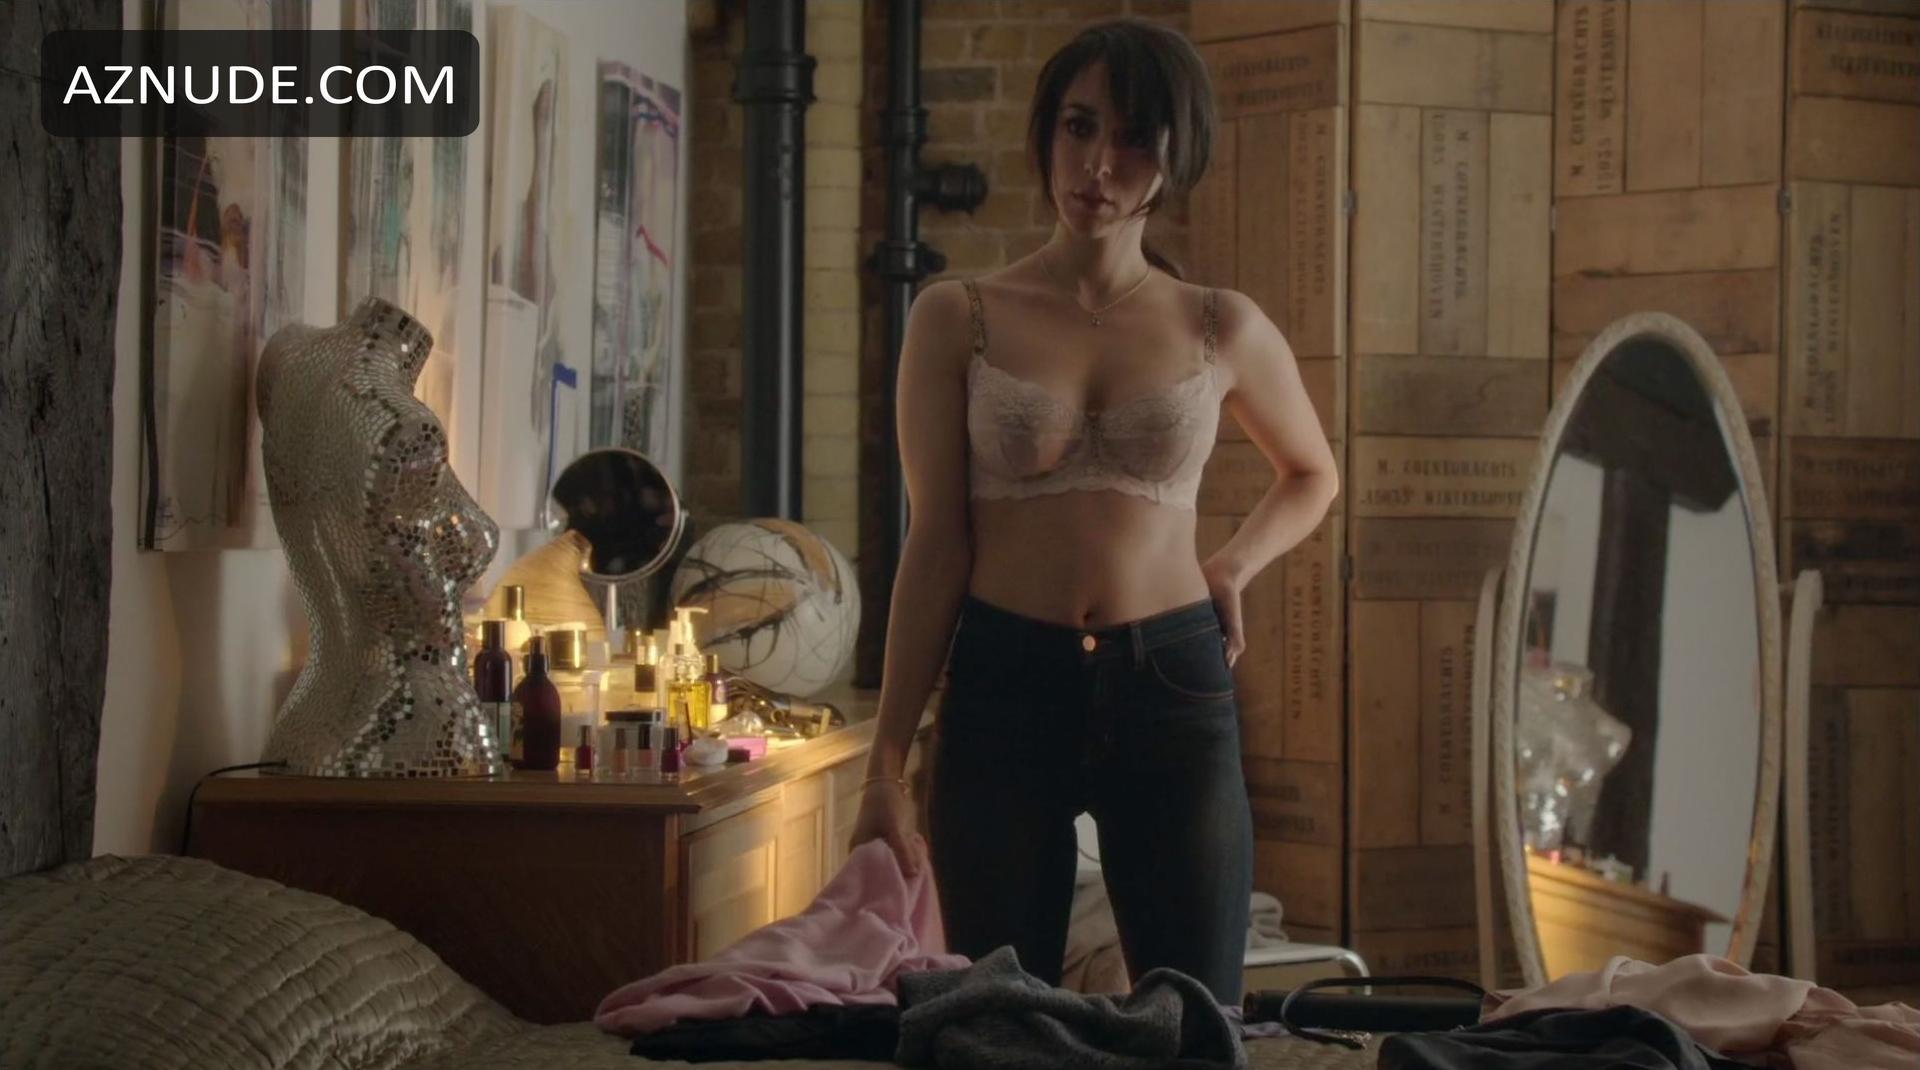 Jemima kirke nude boobs and bush in girls scandalplanetcom 3